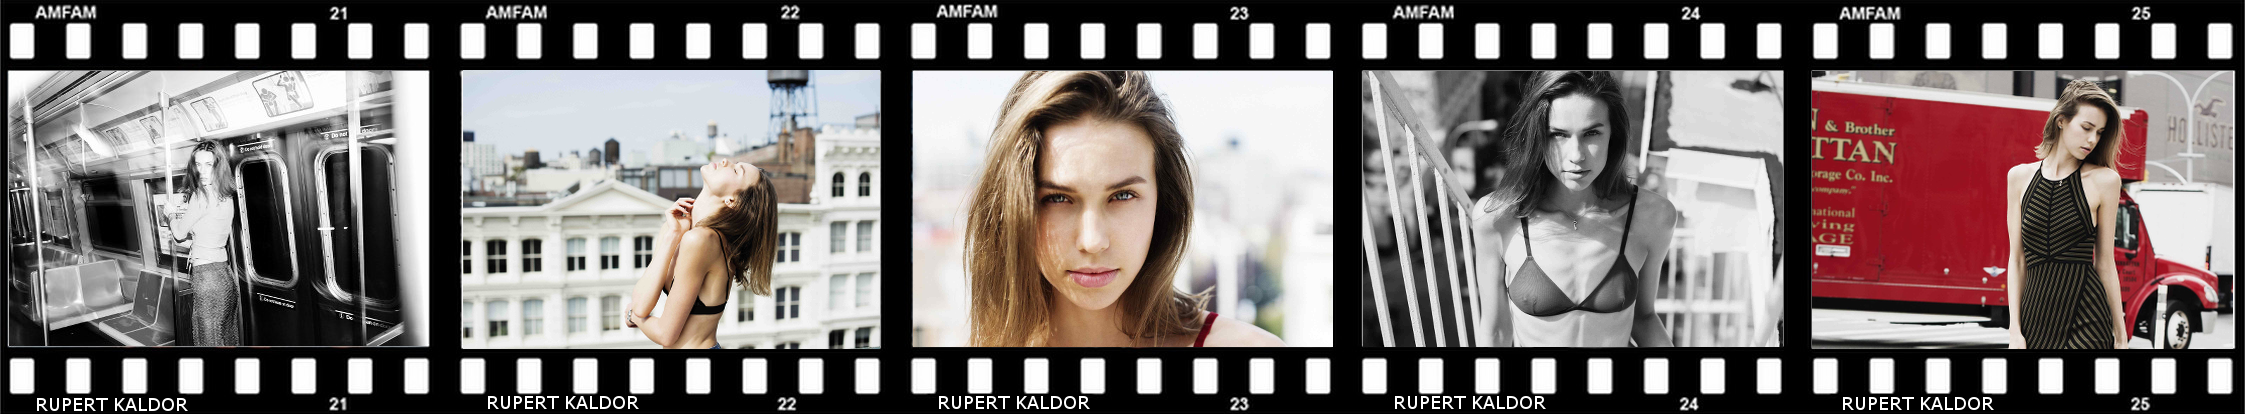 FILMSTRIP2245X414-JGROVES-RUPERT